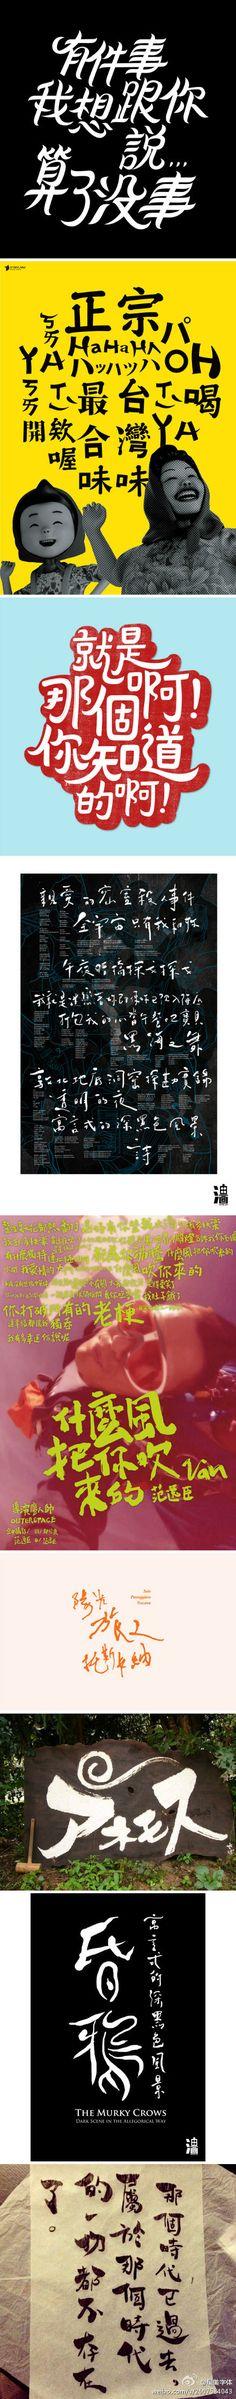 http://ww2.sinaimg.cn/bmiddle/9b6c932btw1e90a3z3qvej20c83g97n8.jpg